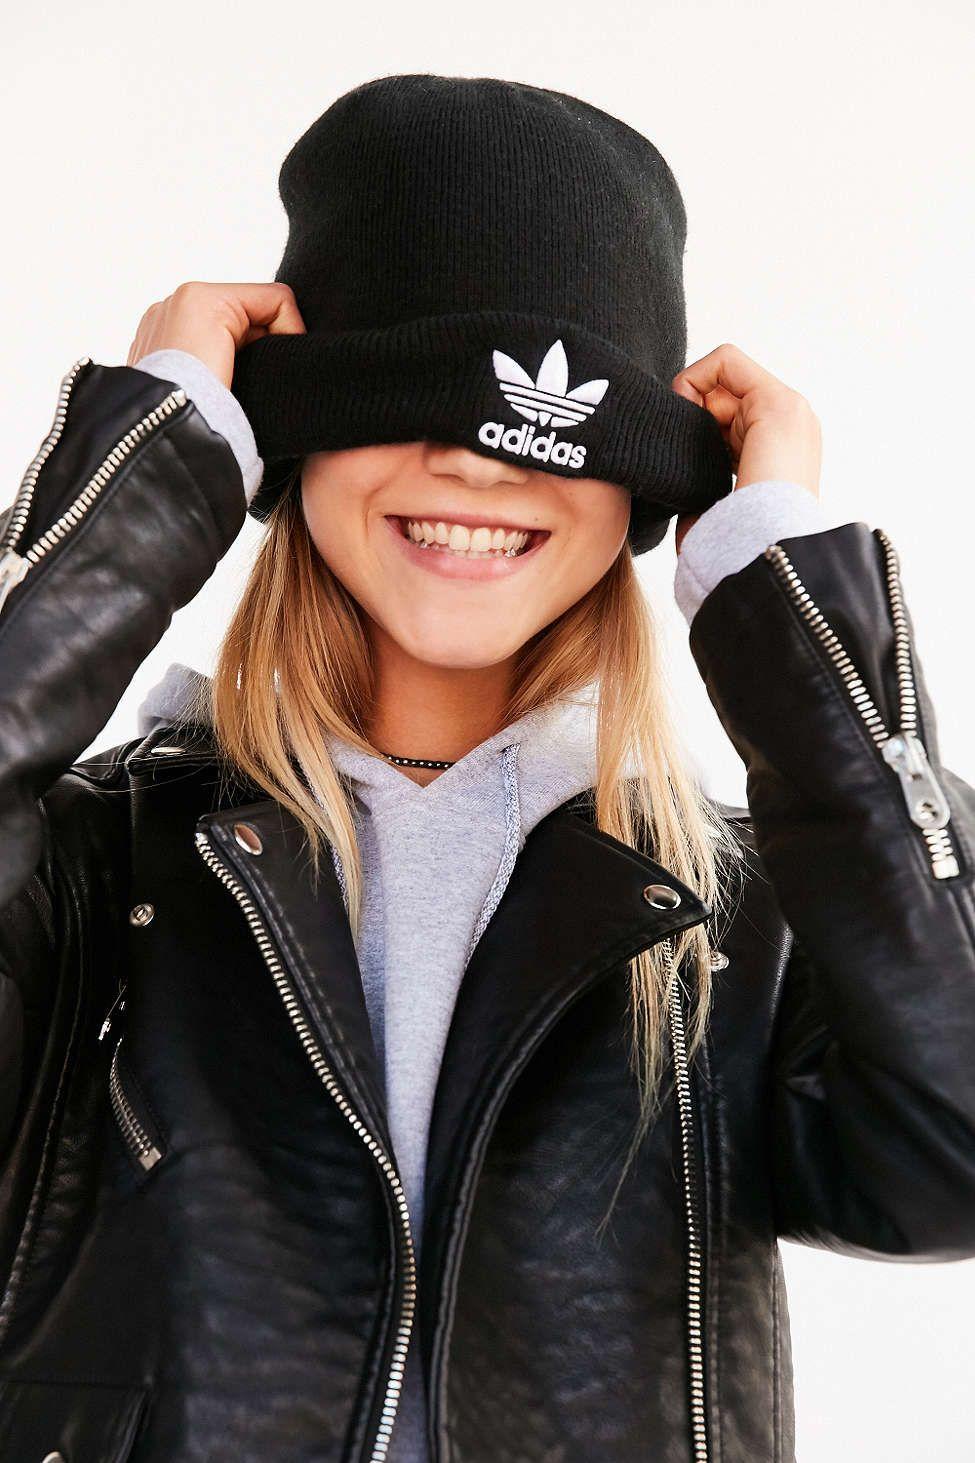 7eb16150d72 adidas Originals Trefoil Cuff Beanie - Urban Outfitters